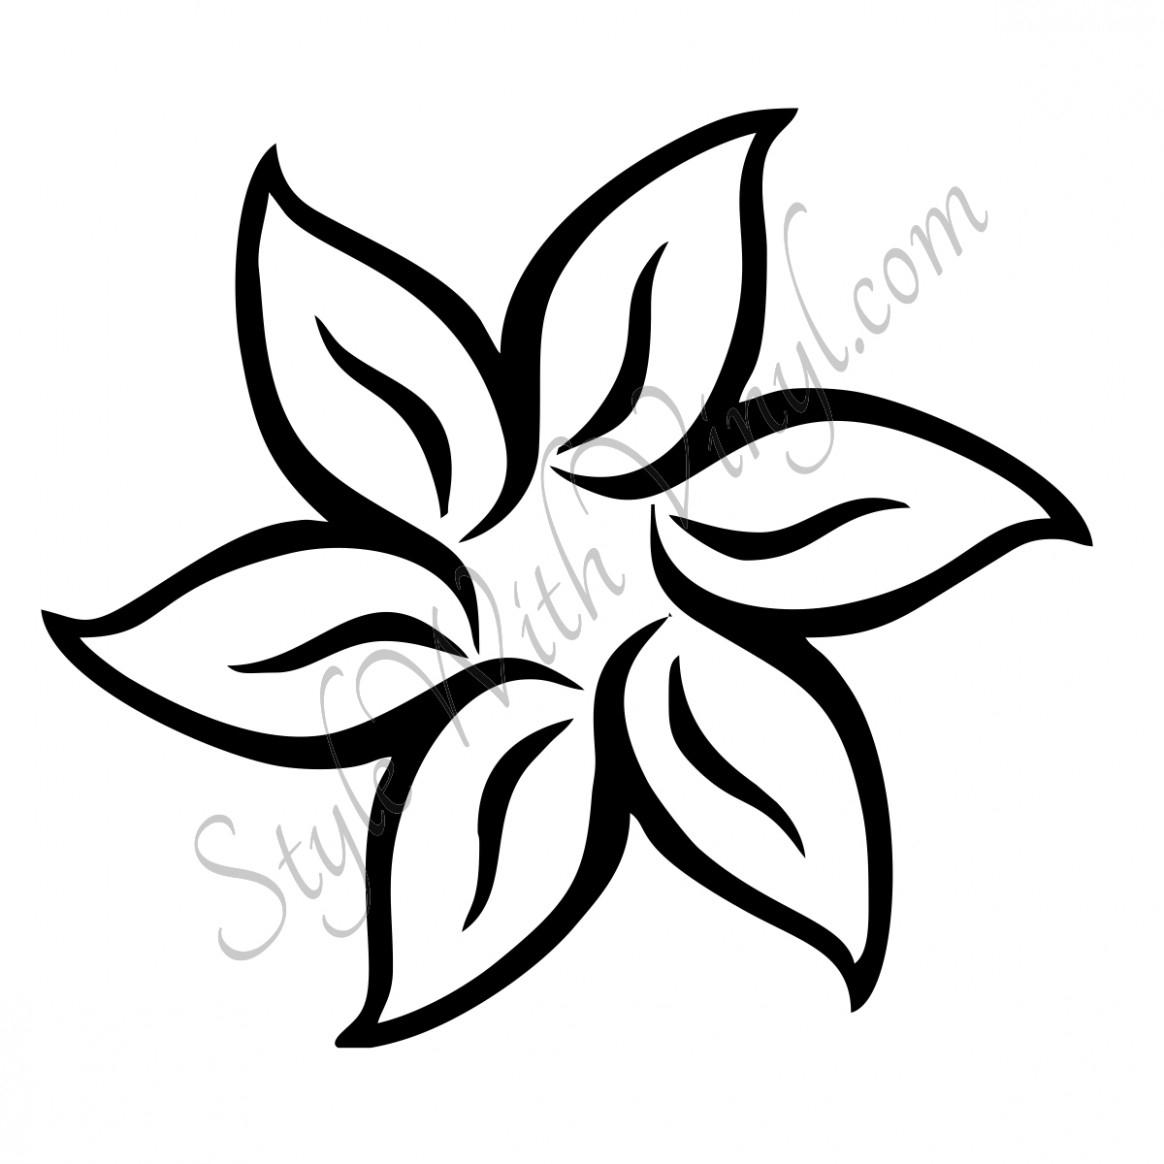 1164x1164 Simple Flower Drawing Simple Flower Drawing Simple Flower Drawing